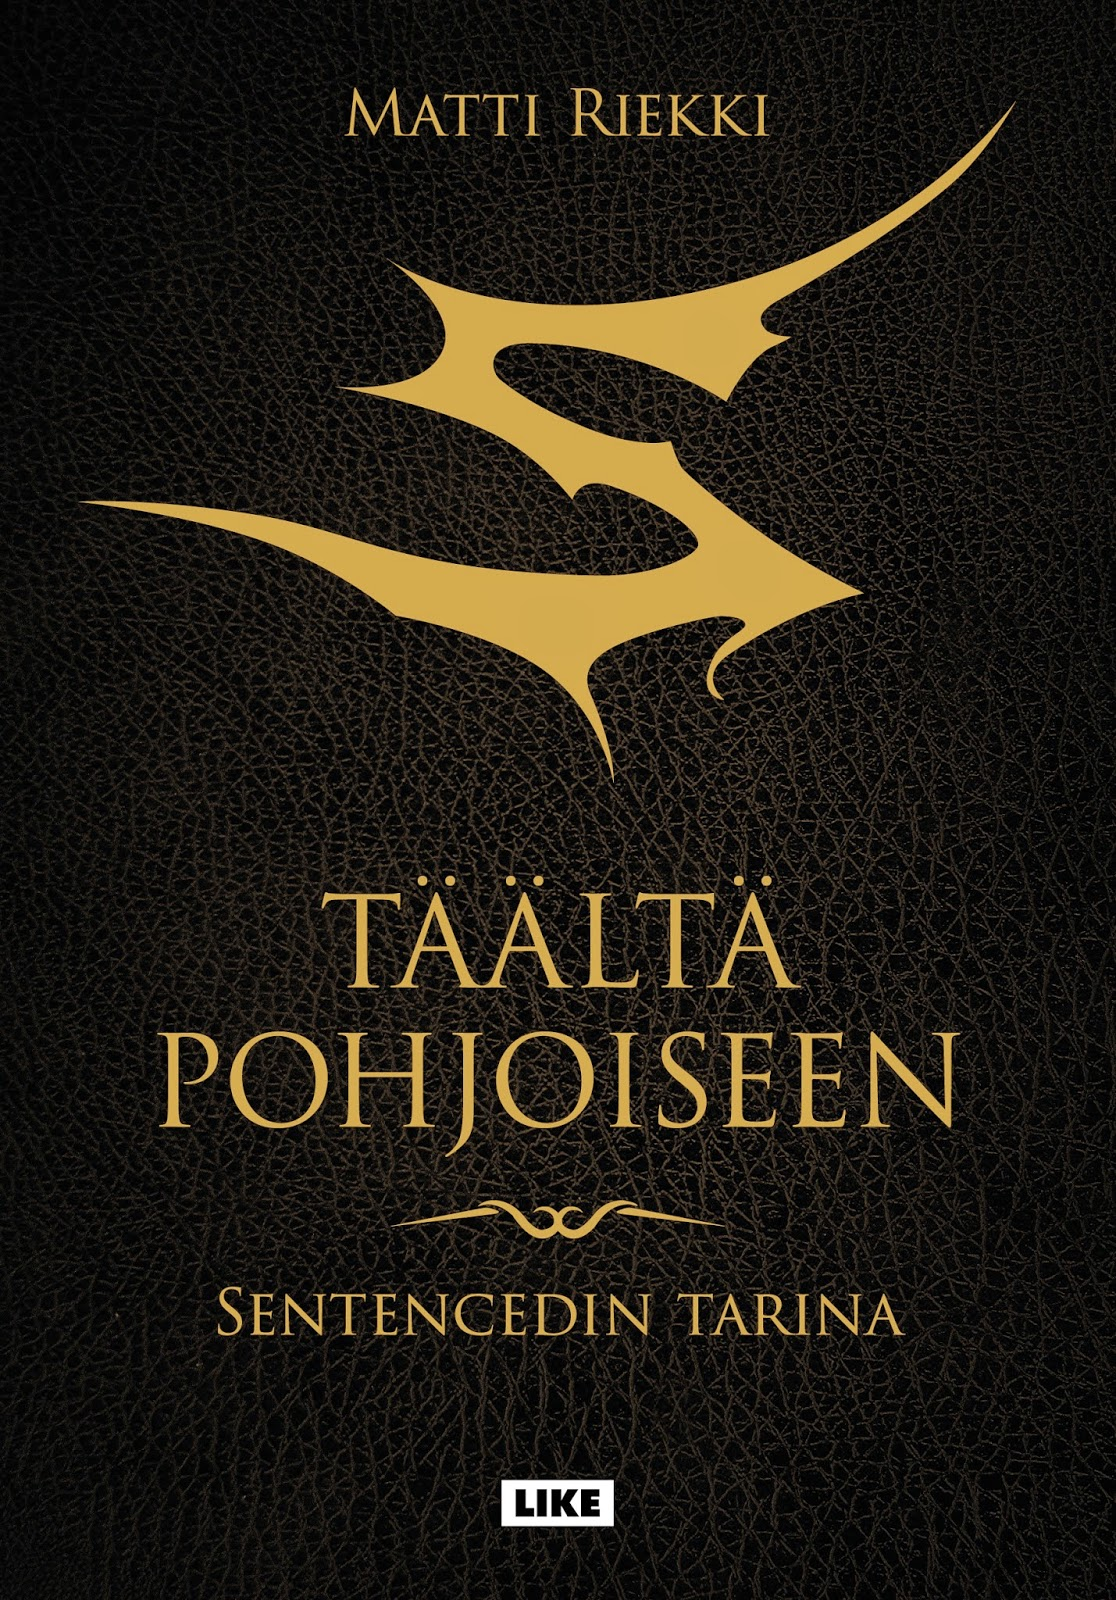 Sentenced Kirja